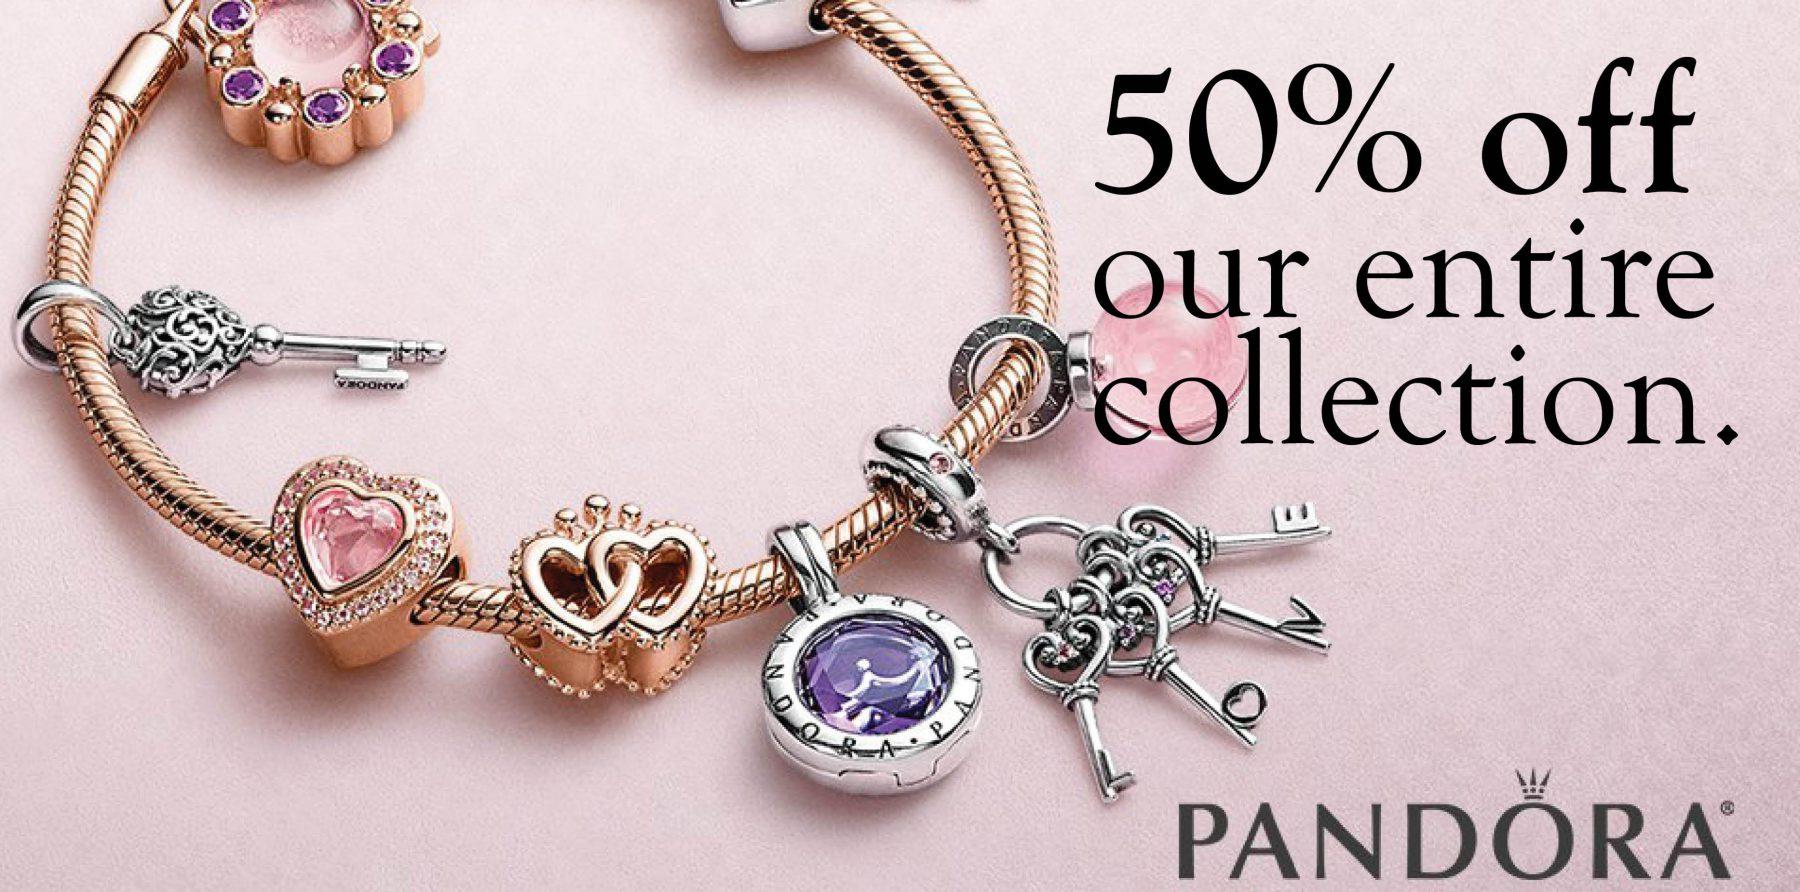 February Pandora Sale – 50% Off